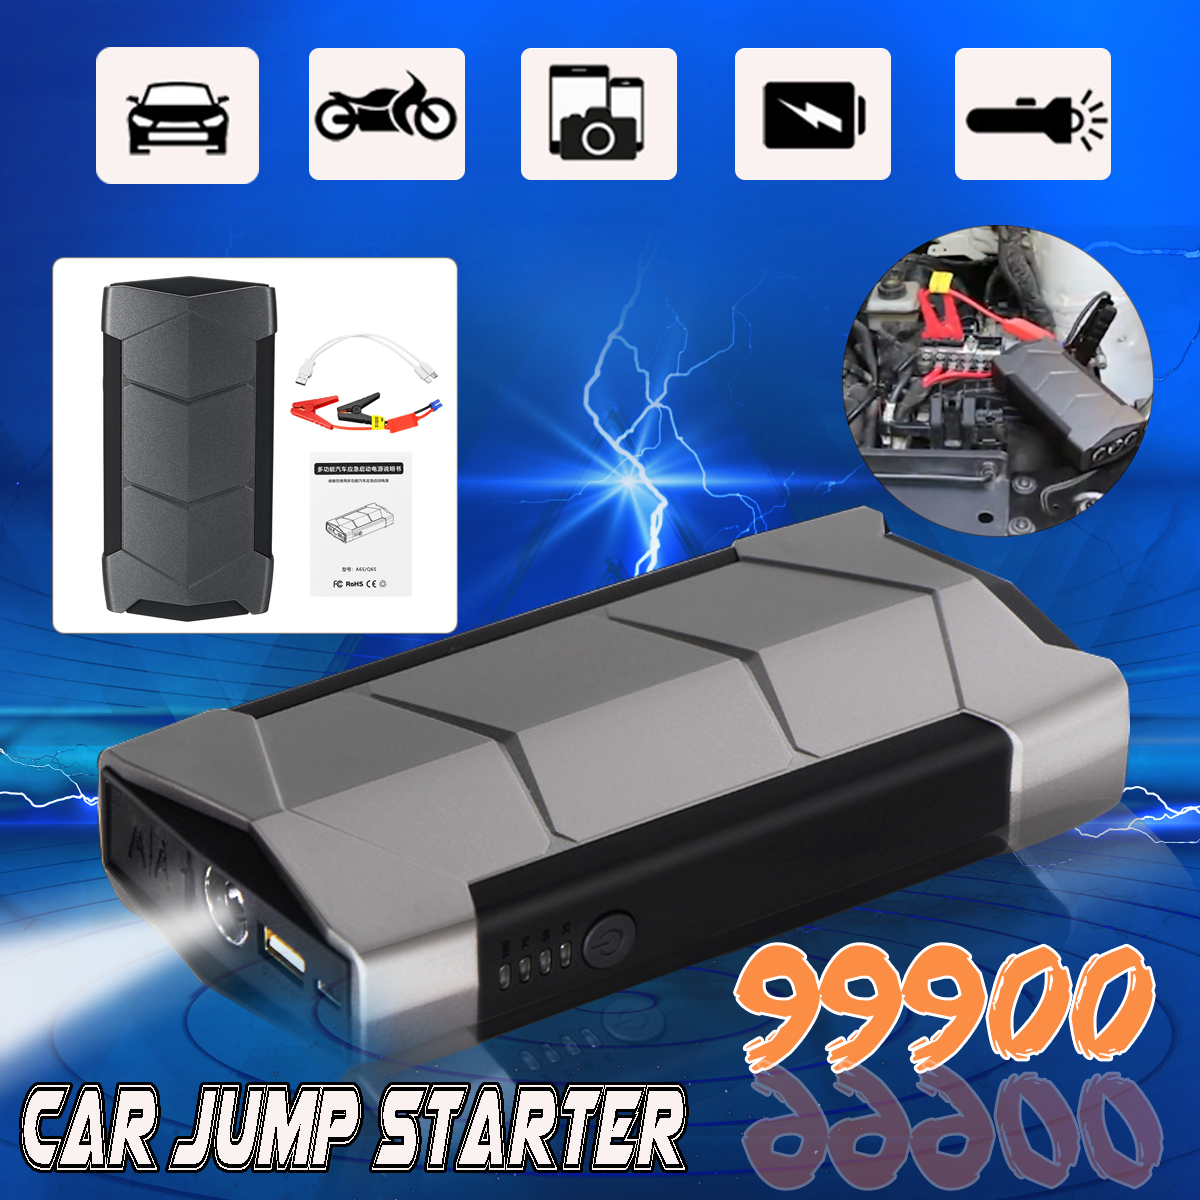 Mini Portable 12V 99900mAh Car Jump Starter Battery USB Charger Emergency Power Bank SOS LED Torch Light For Starting Device